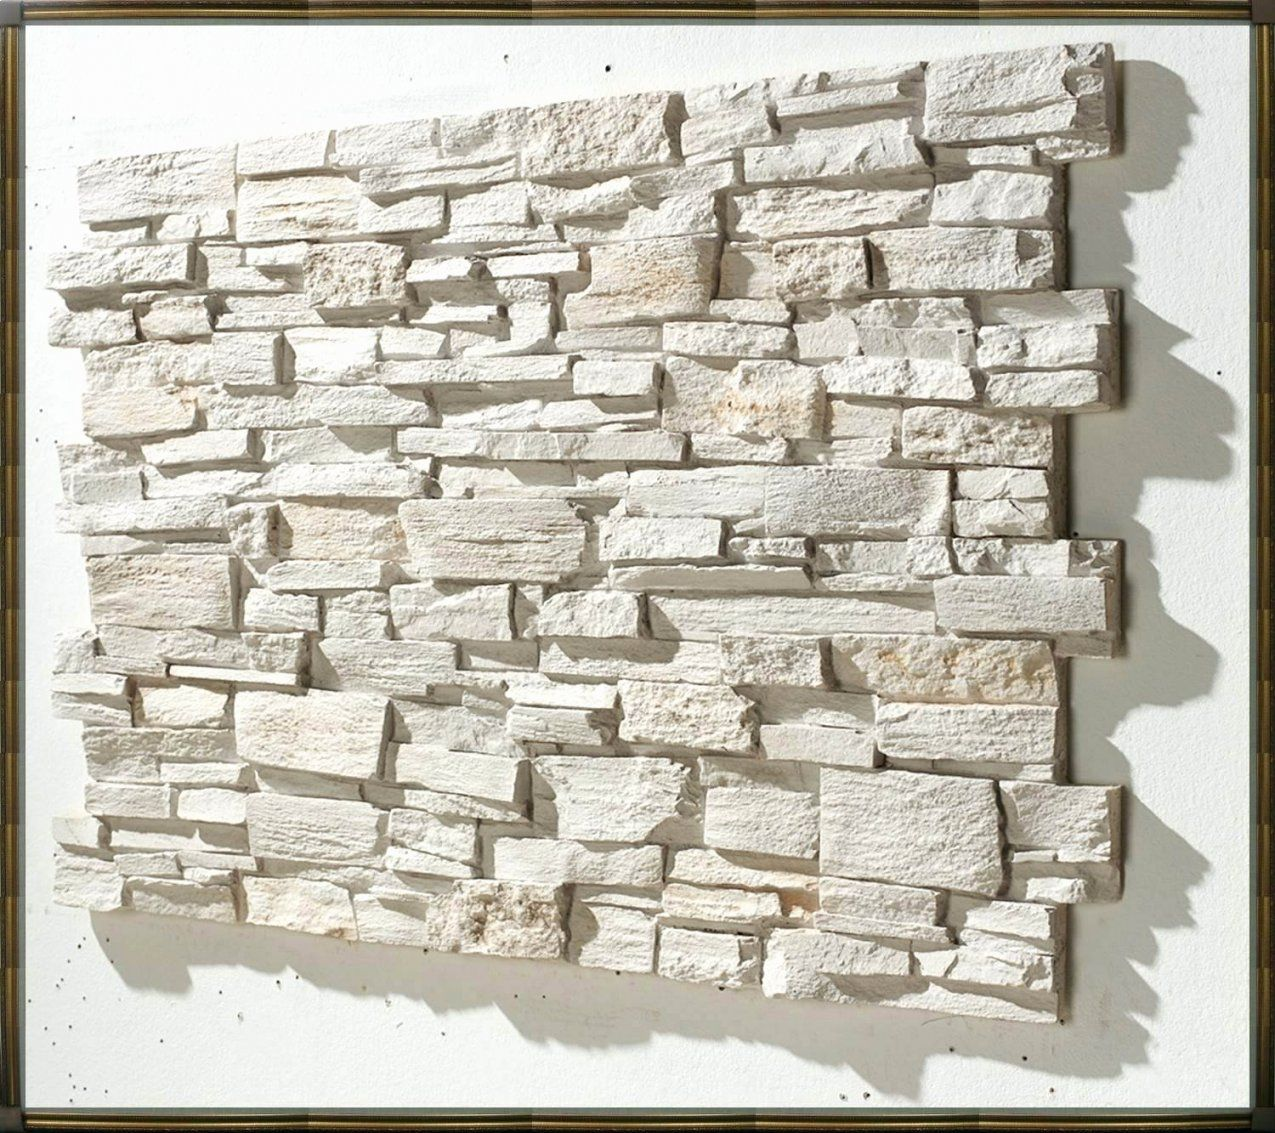 Wandverkleidung Innen Steinoptik Genial Wandverkleidung Steinoptik von Wandverkleidung Steinoptik Kunststoff Innen Bild